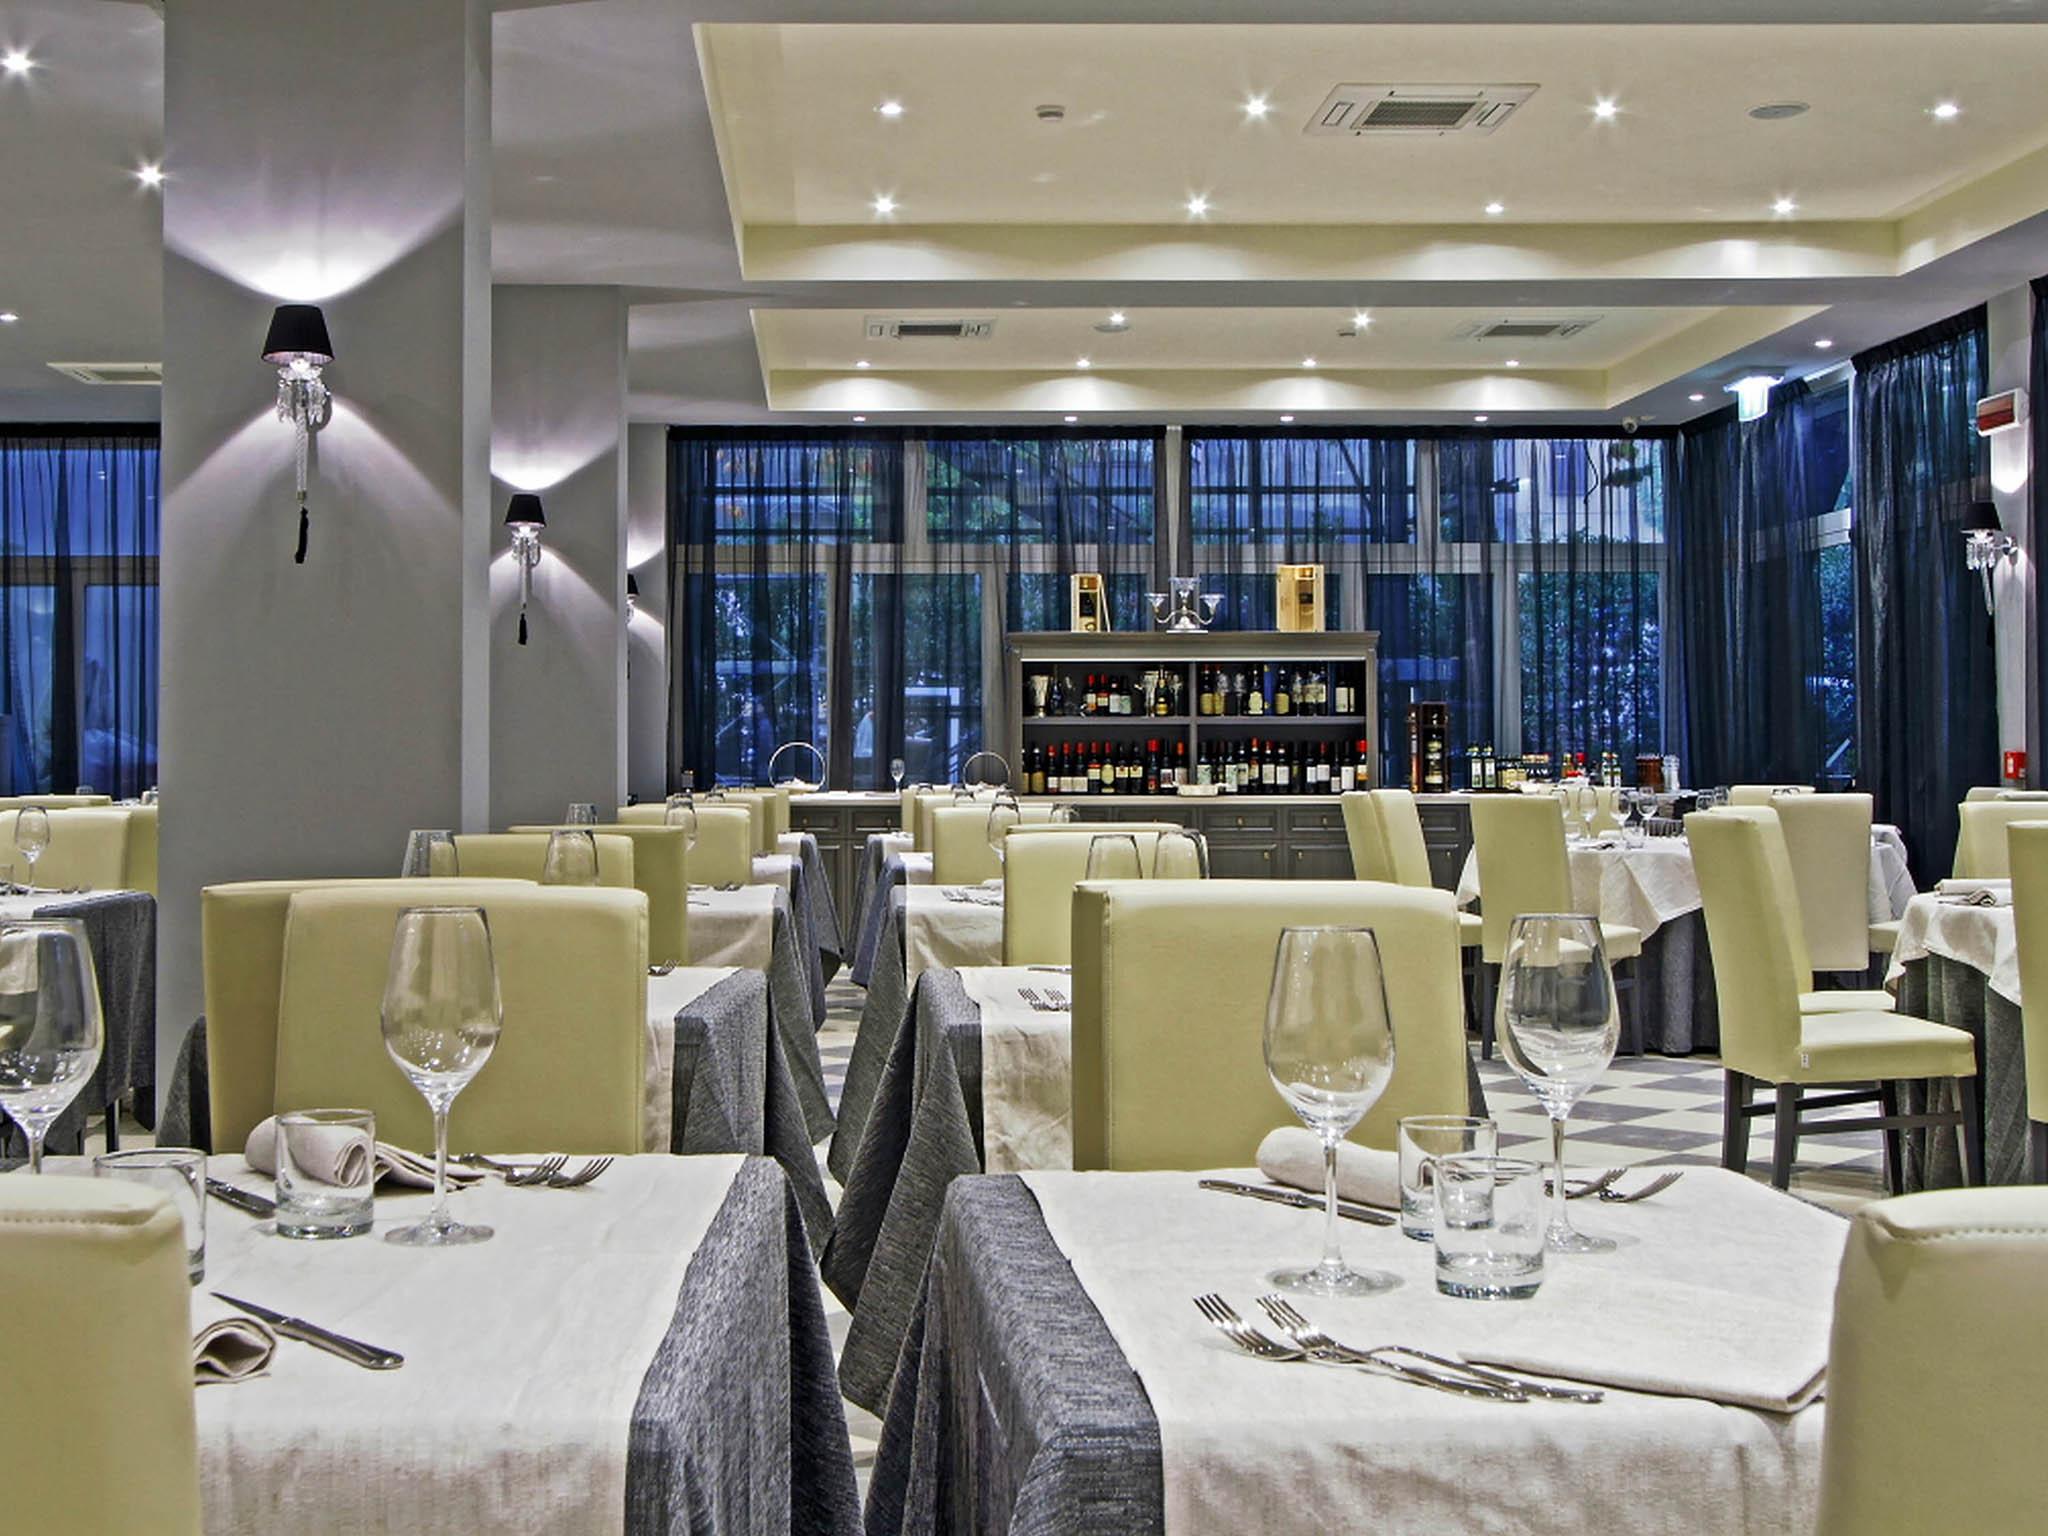 Hotel en casalecchio di reno boutique hotel calzavecchio for Hotel casalecchio bologna